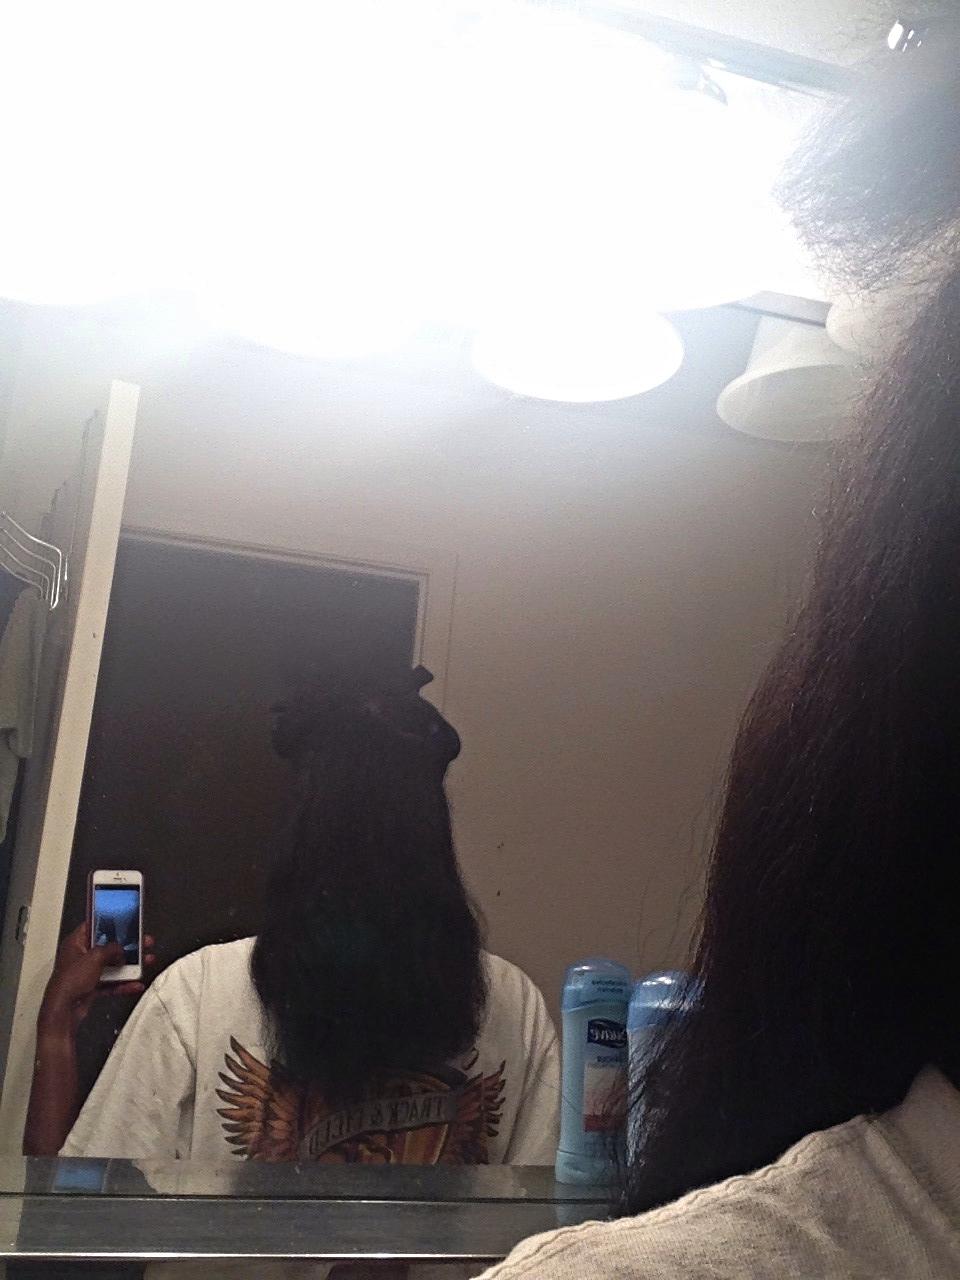 Hair in May 2014